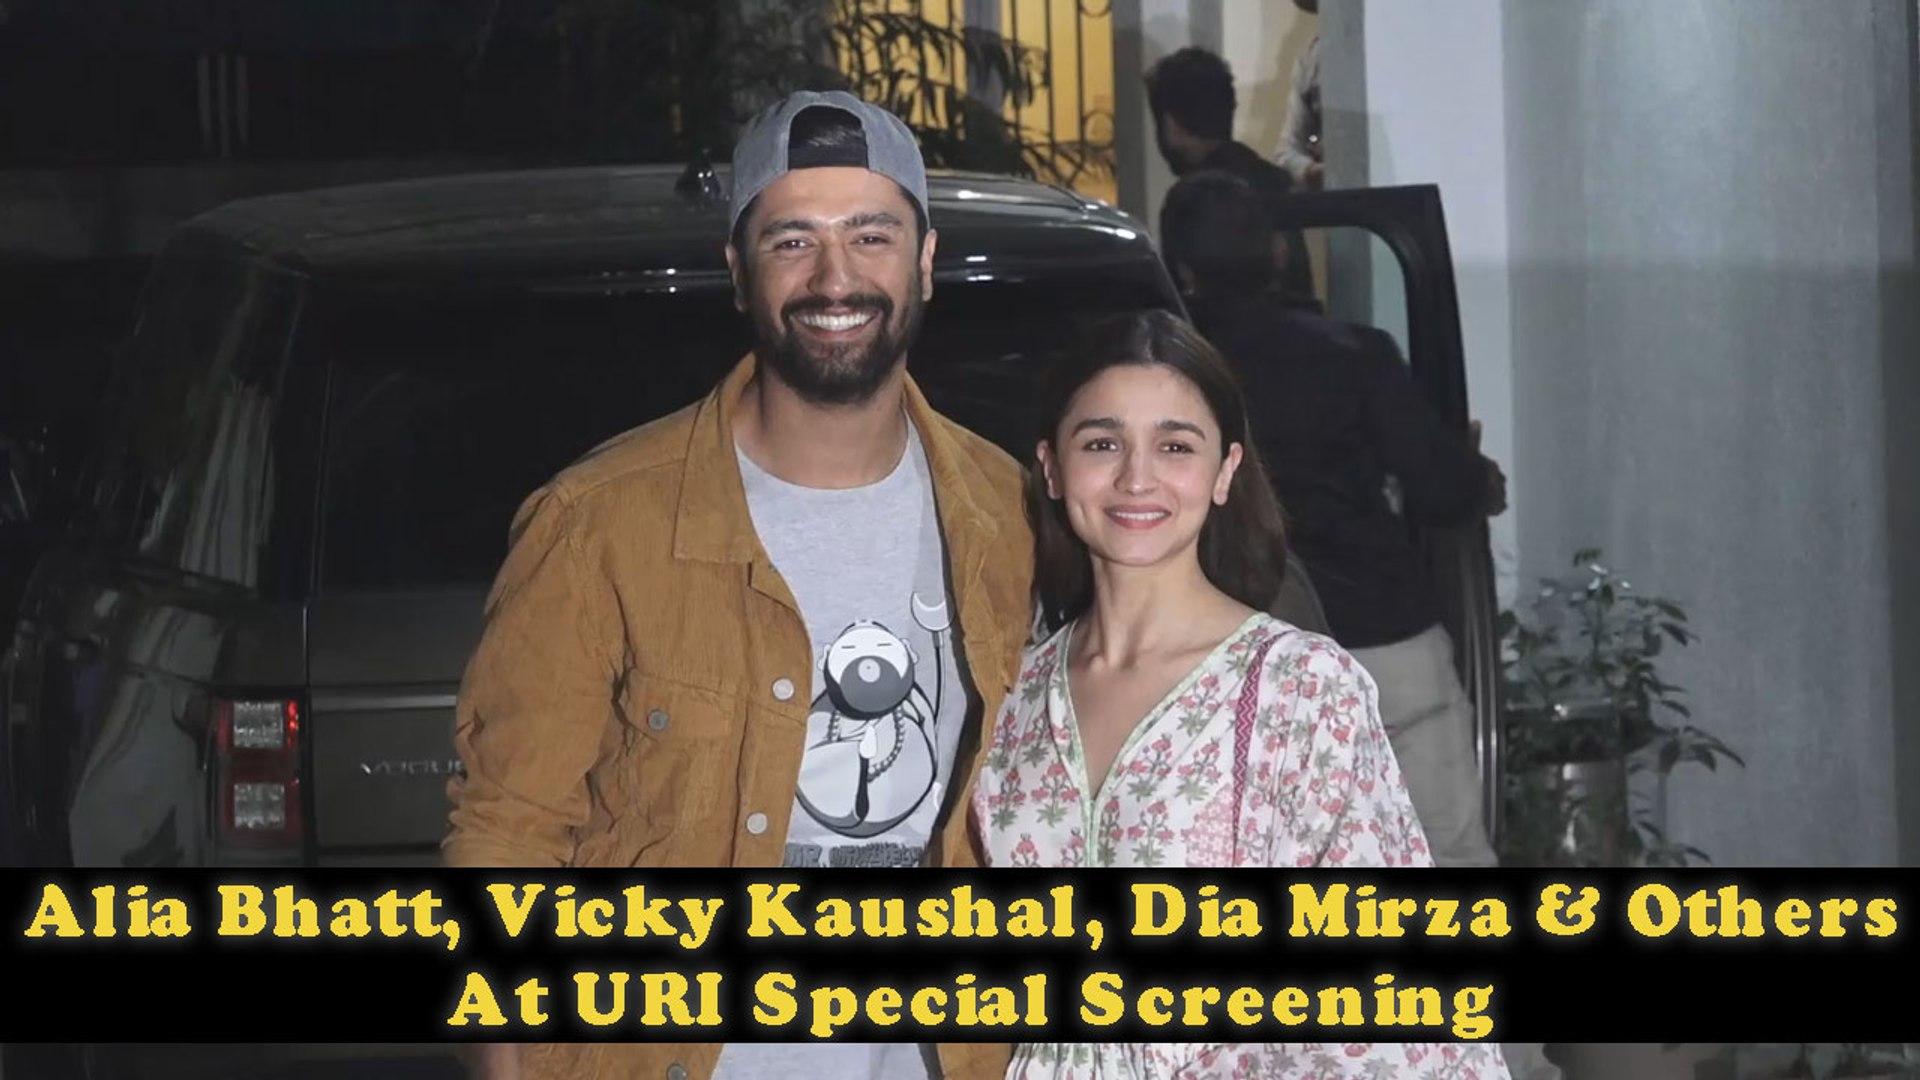 Alia Bhatt, Vicky Kaushal, Dia Mirza & Others At Uri Special Screening   Filmibeat